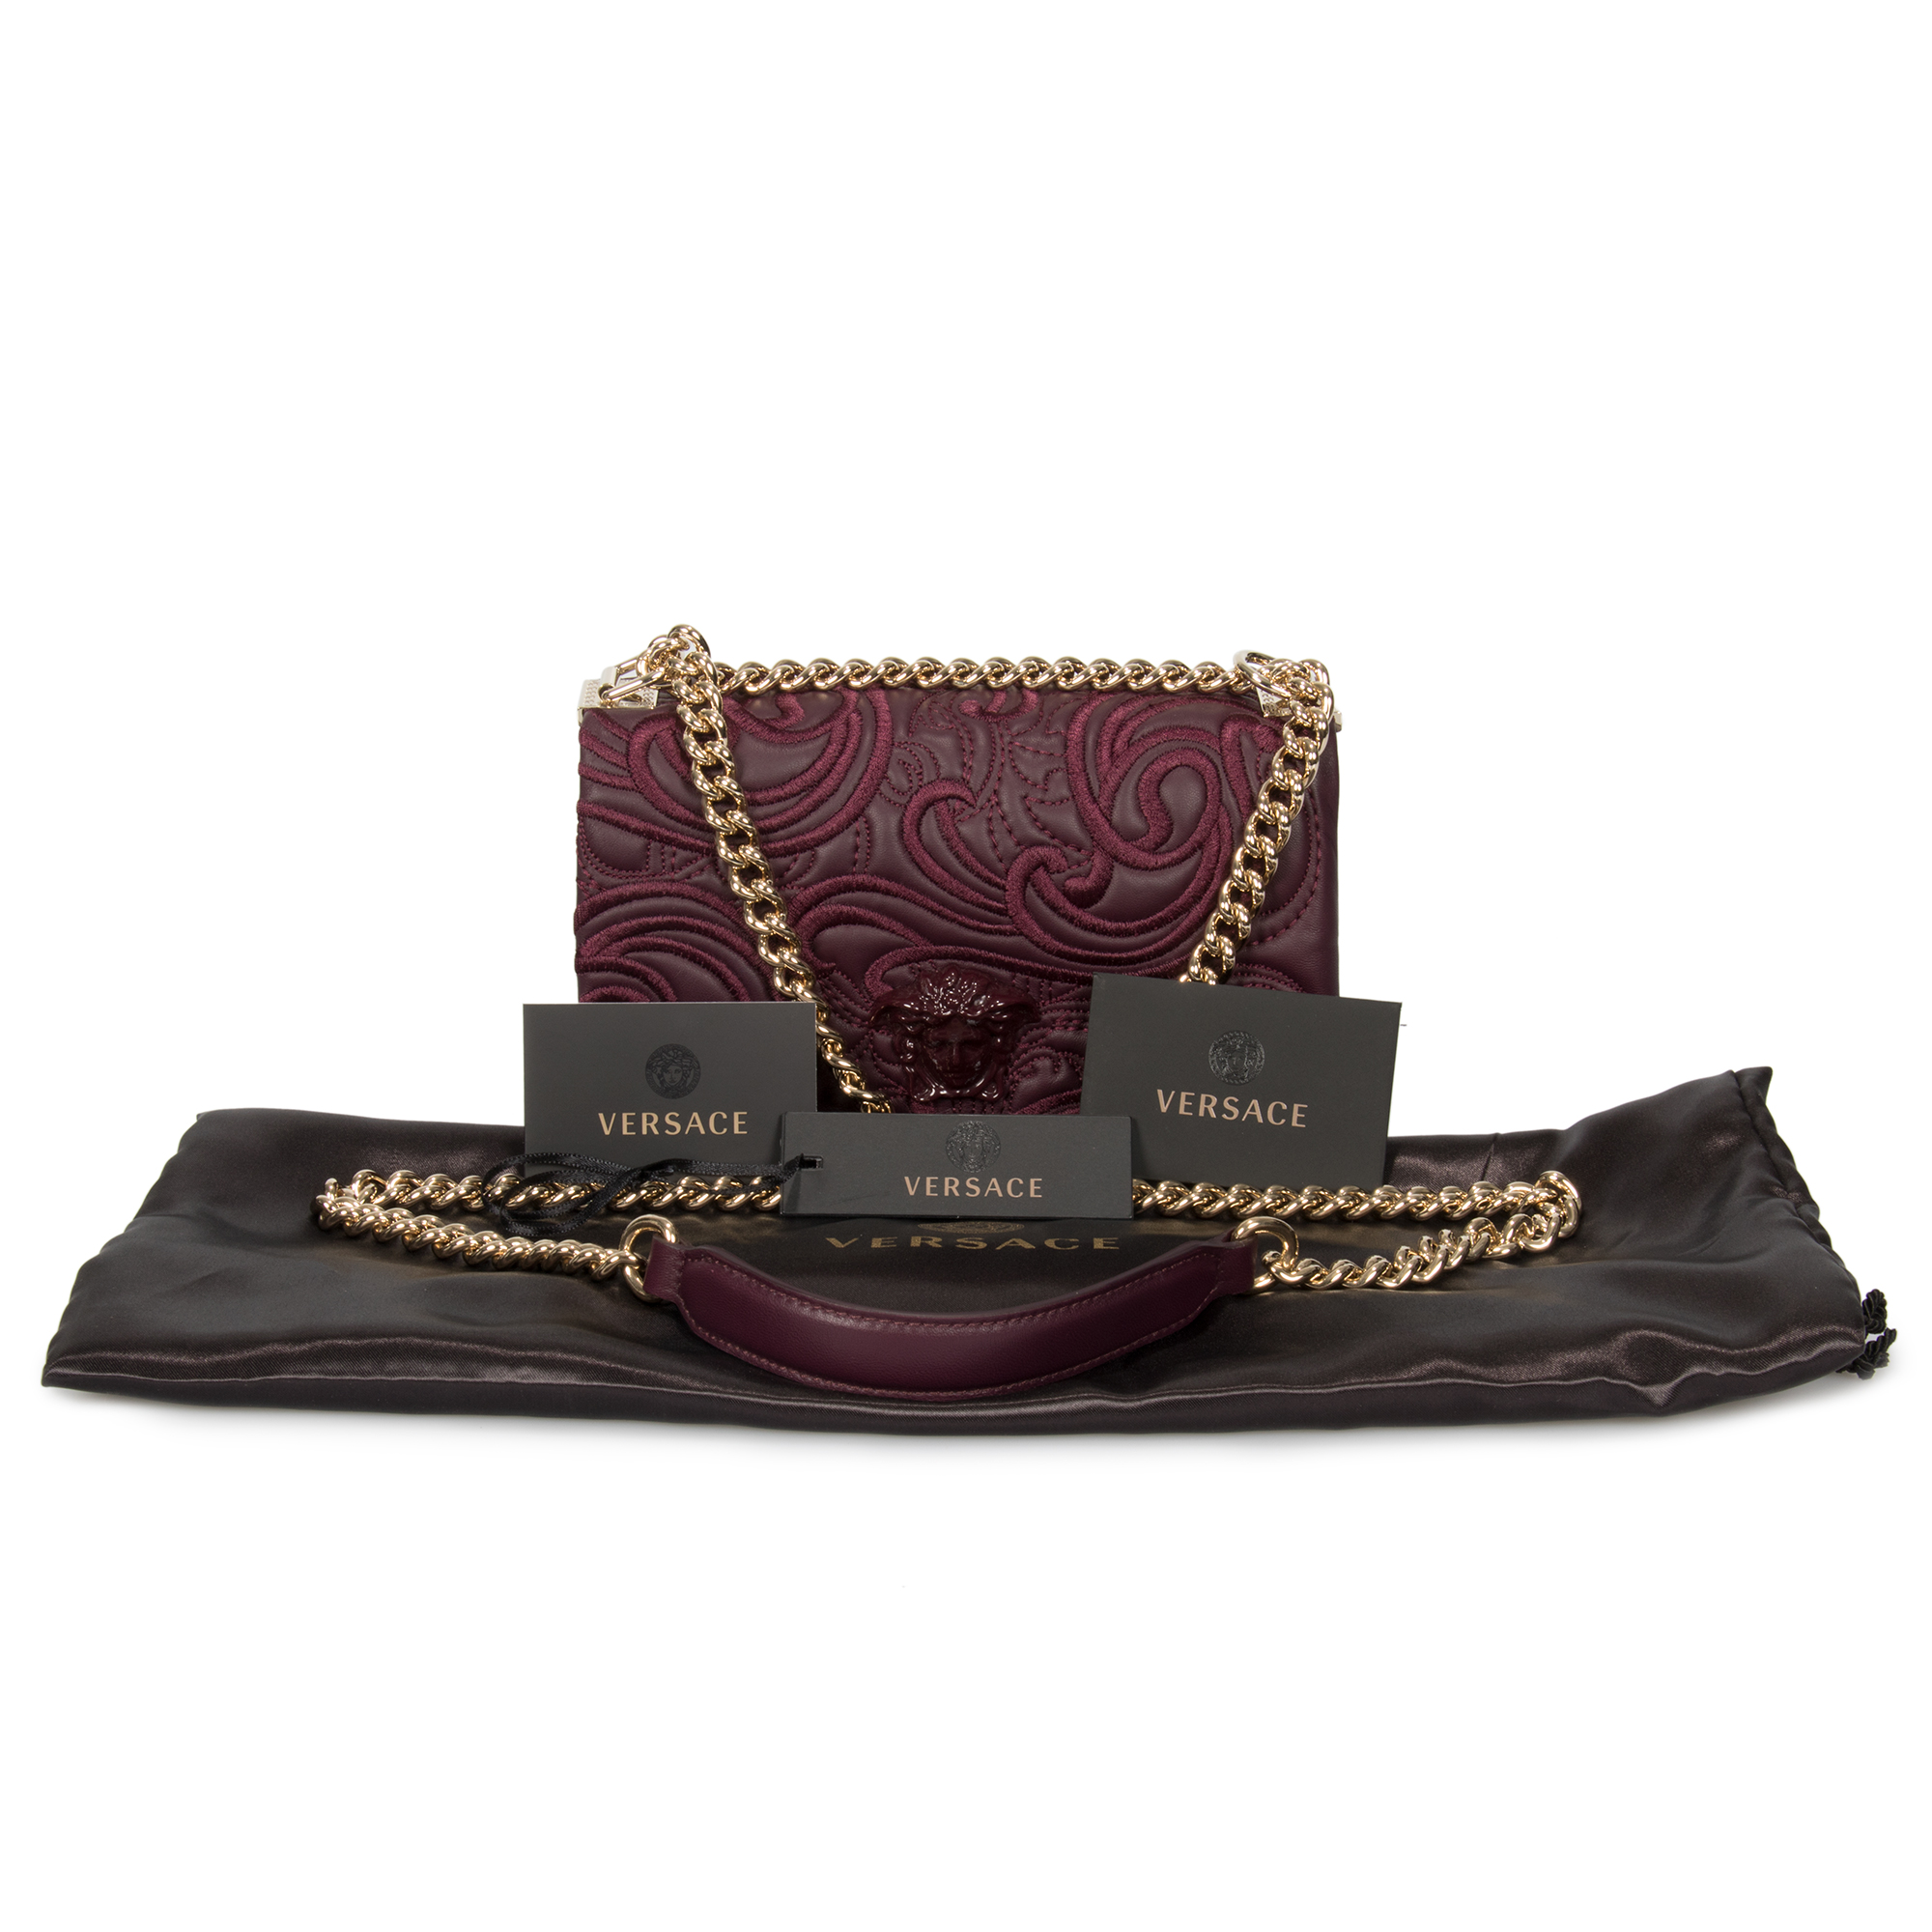 314fbadf9d Versace Embroidered Baroque Shoulder Bag